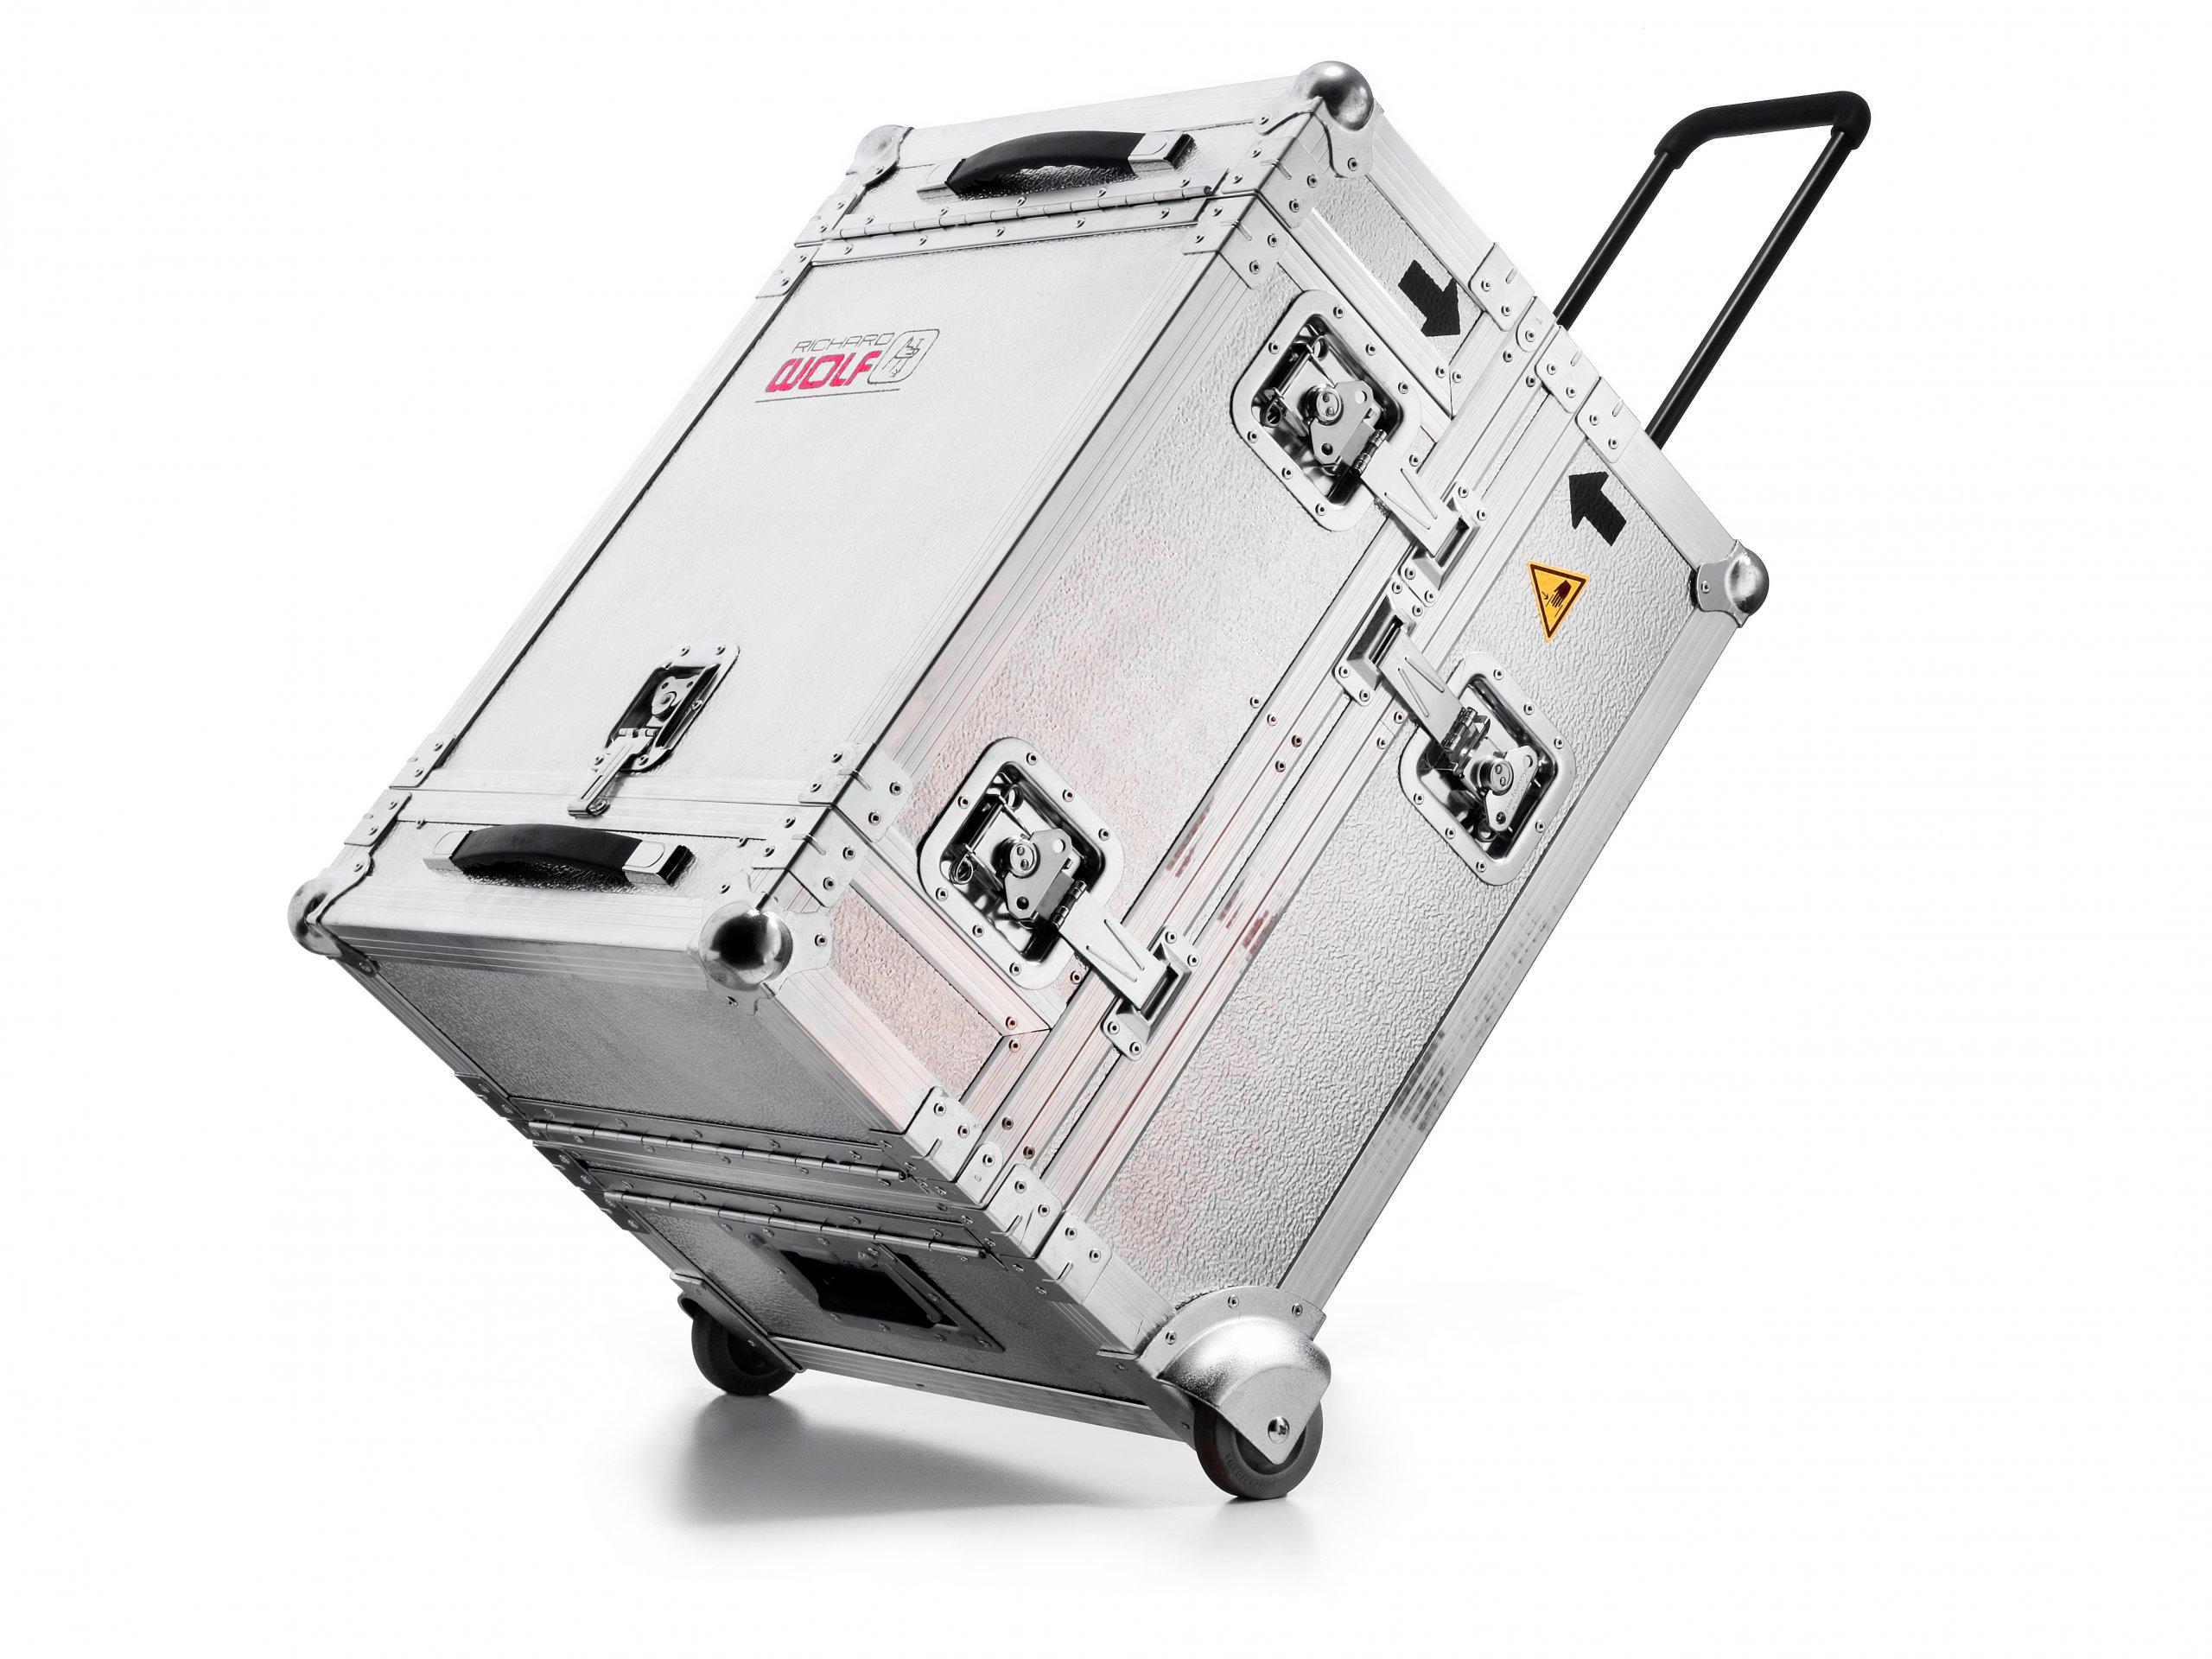 Transportkoffer für Medizingerät